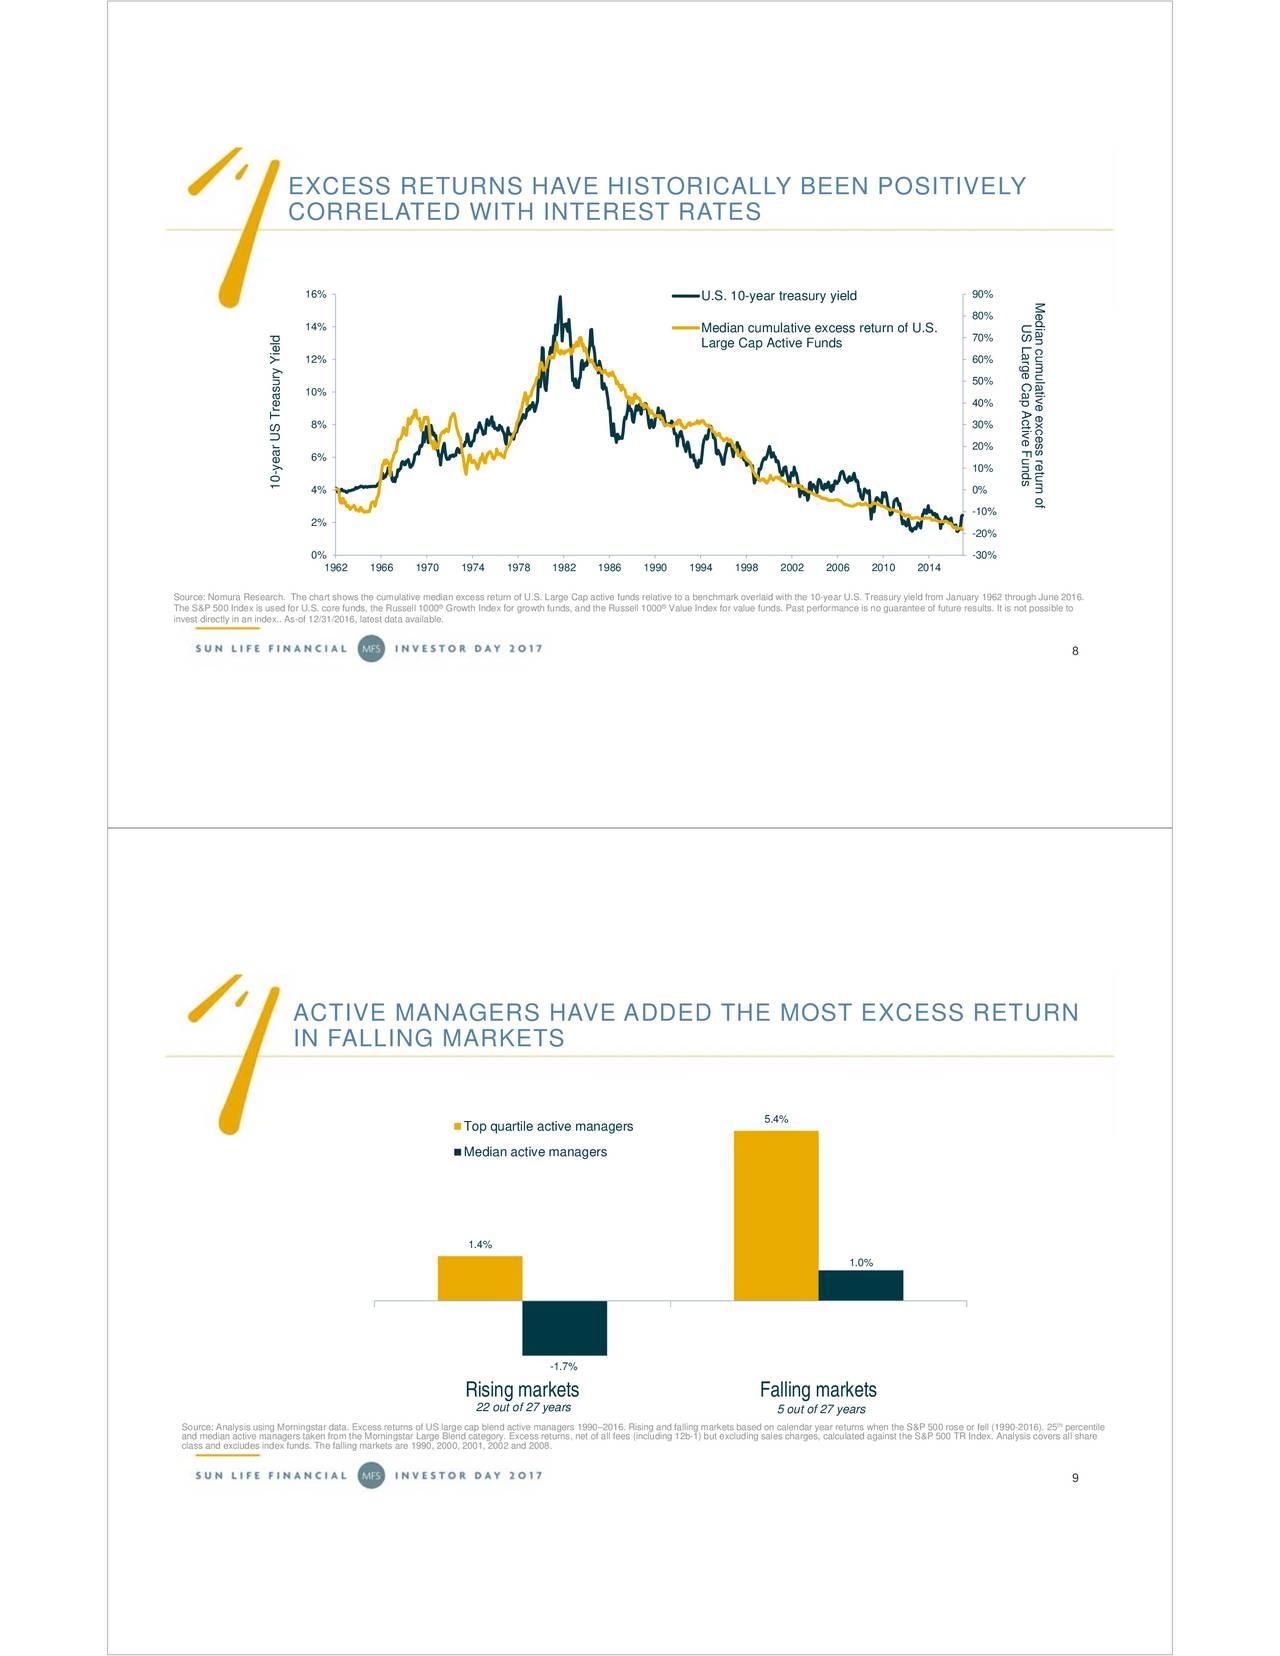 Stock Quote Sun Life Financial: Sun Life Financial (SLF) Investor Presentation